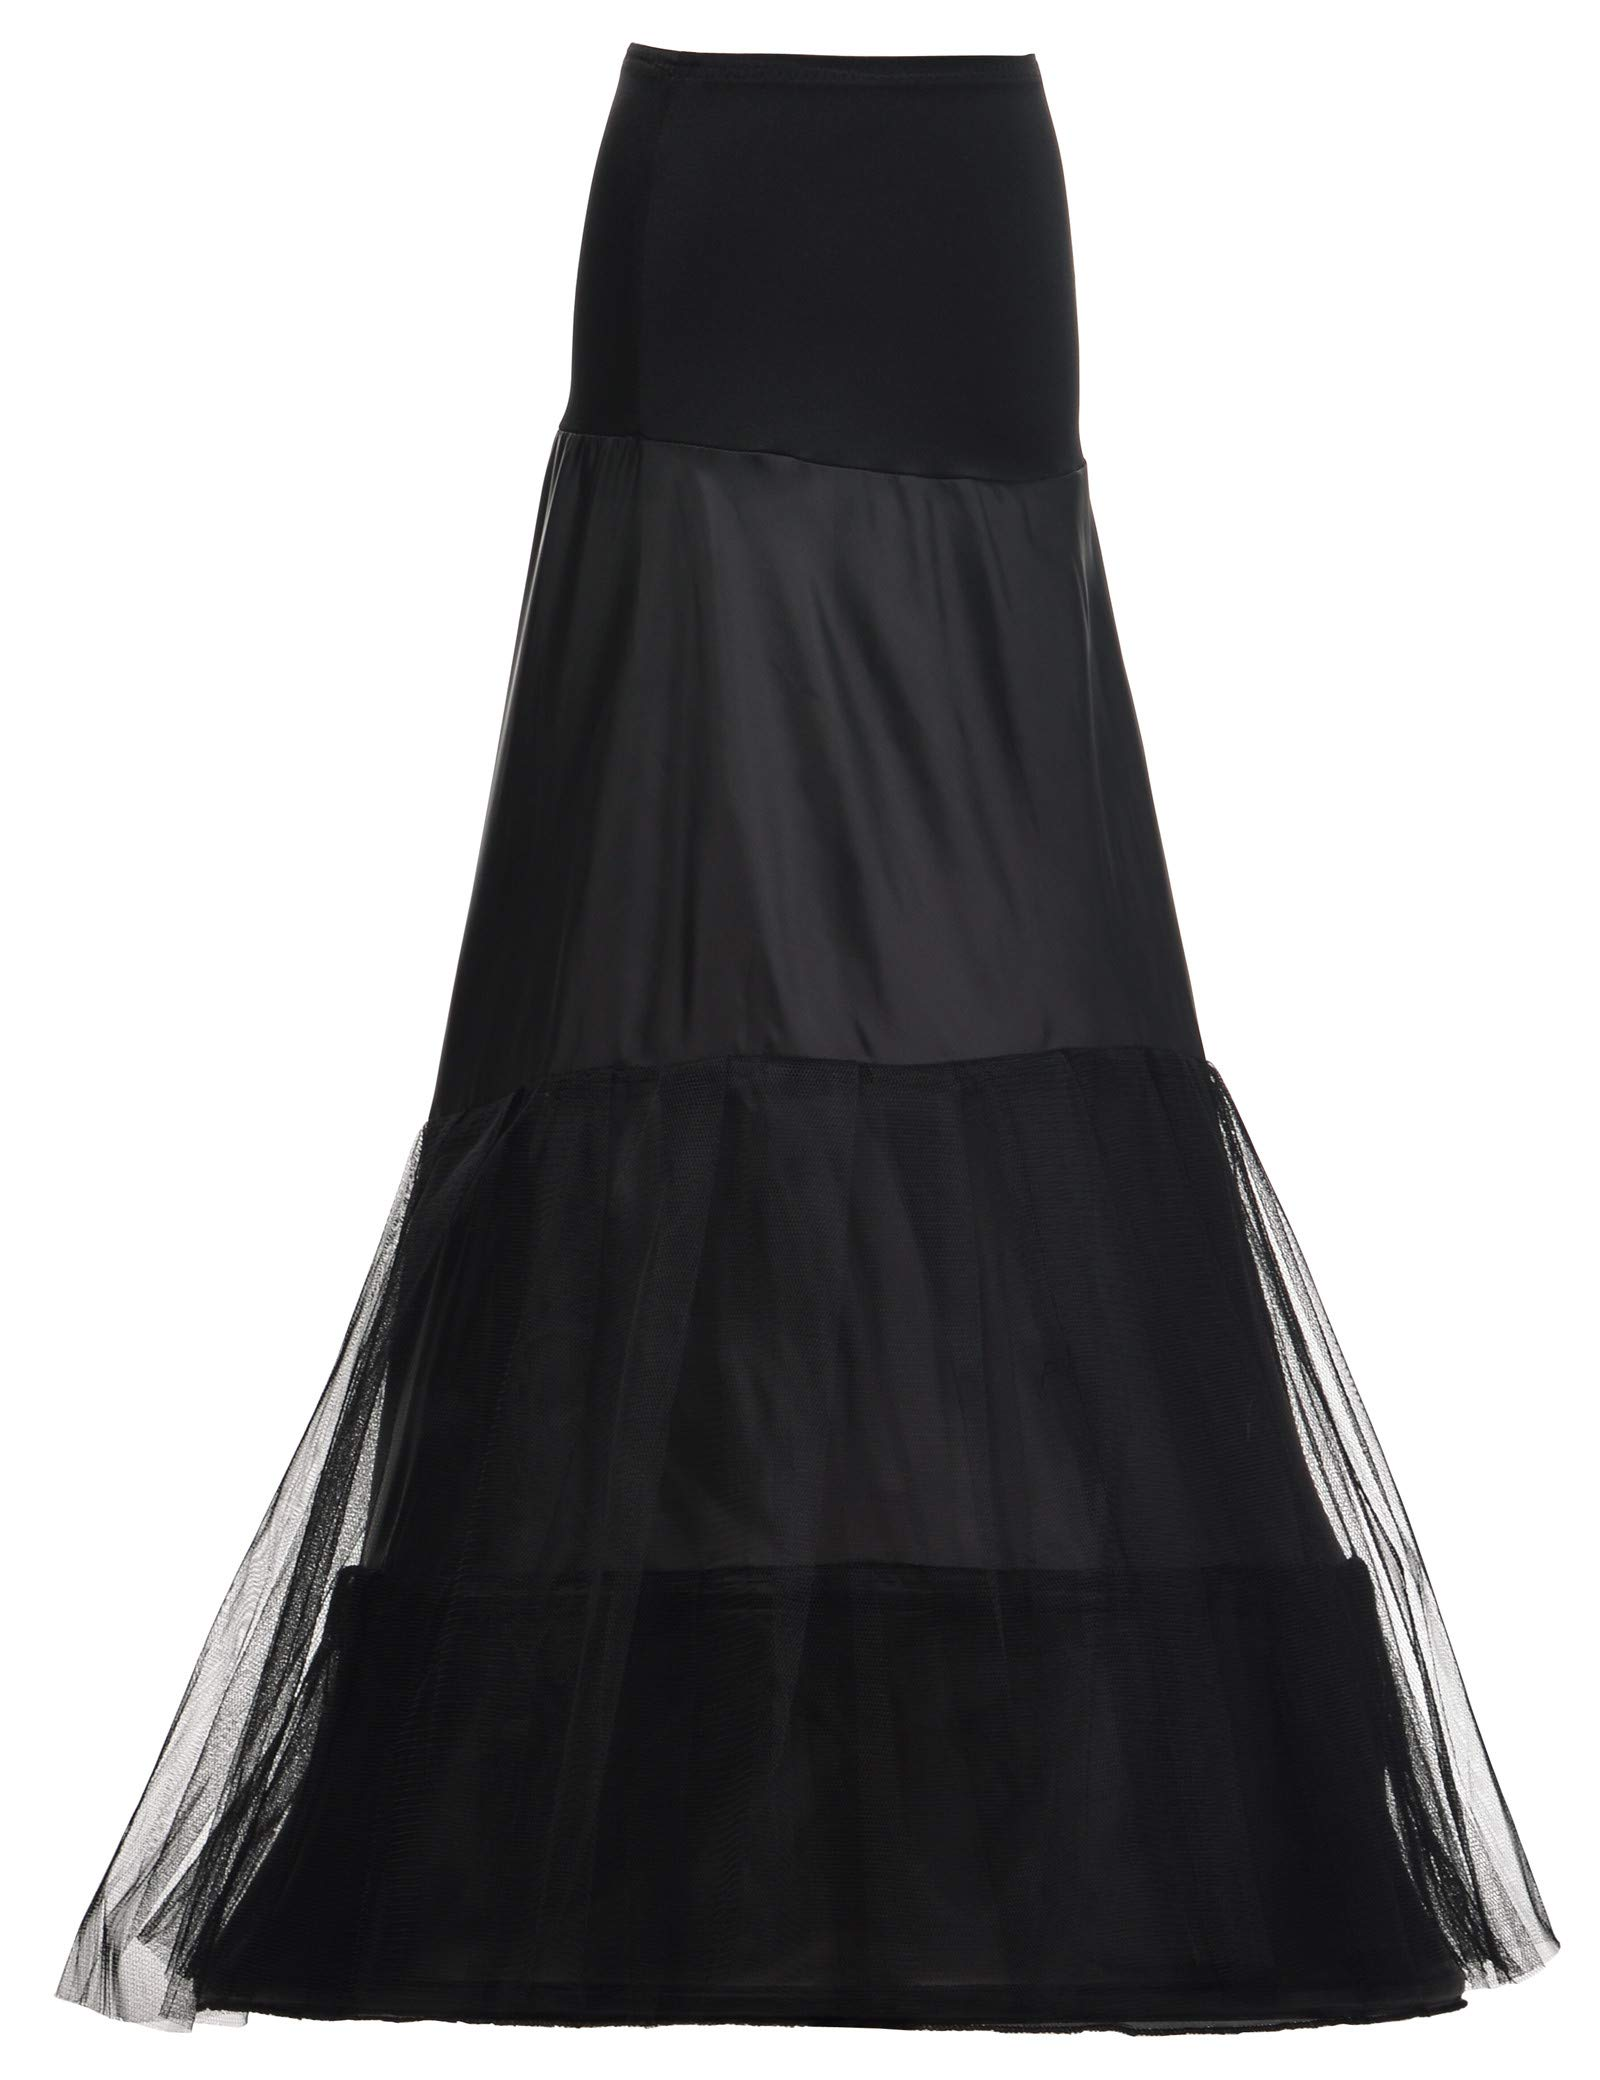 Remedios Women's Mermaid Fishtail Crinoline Petticoat Floor Length Wedding Underskirt Half Slip